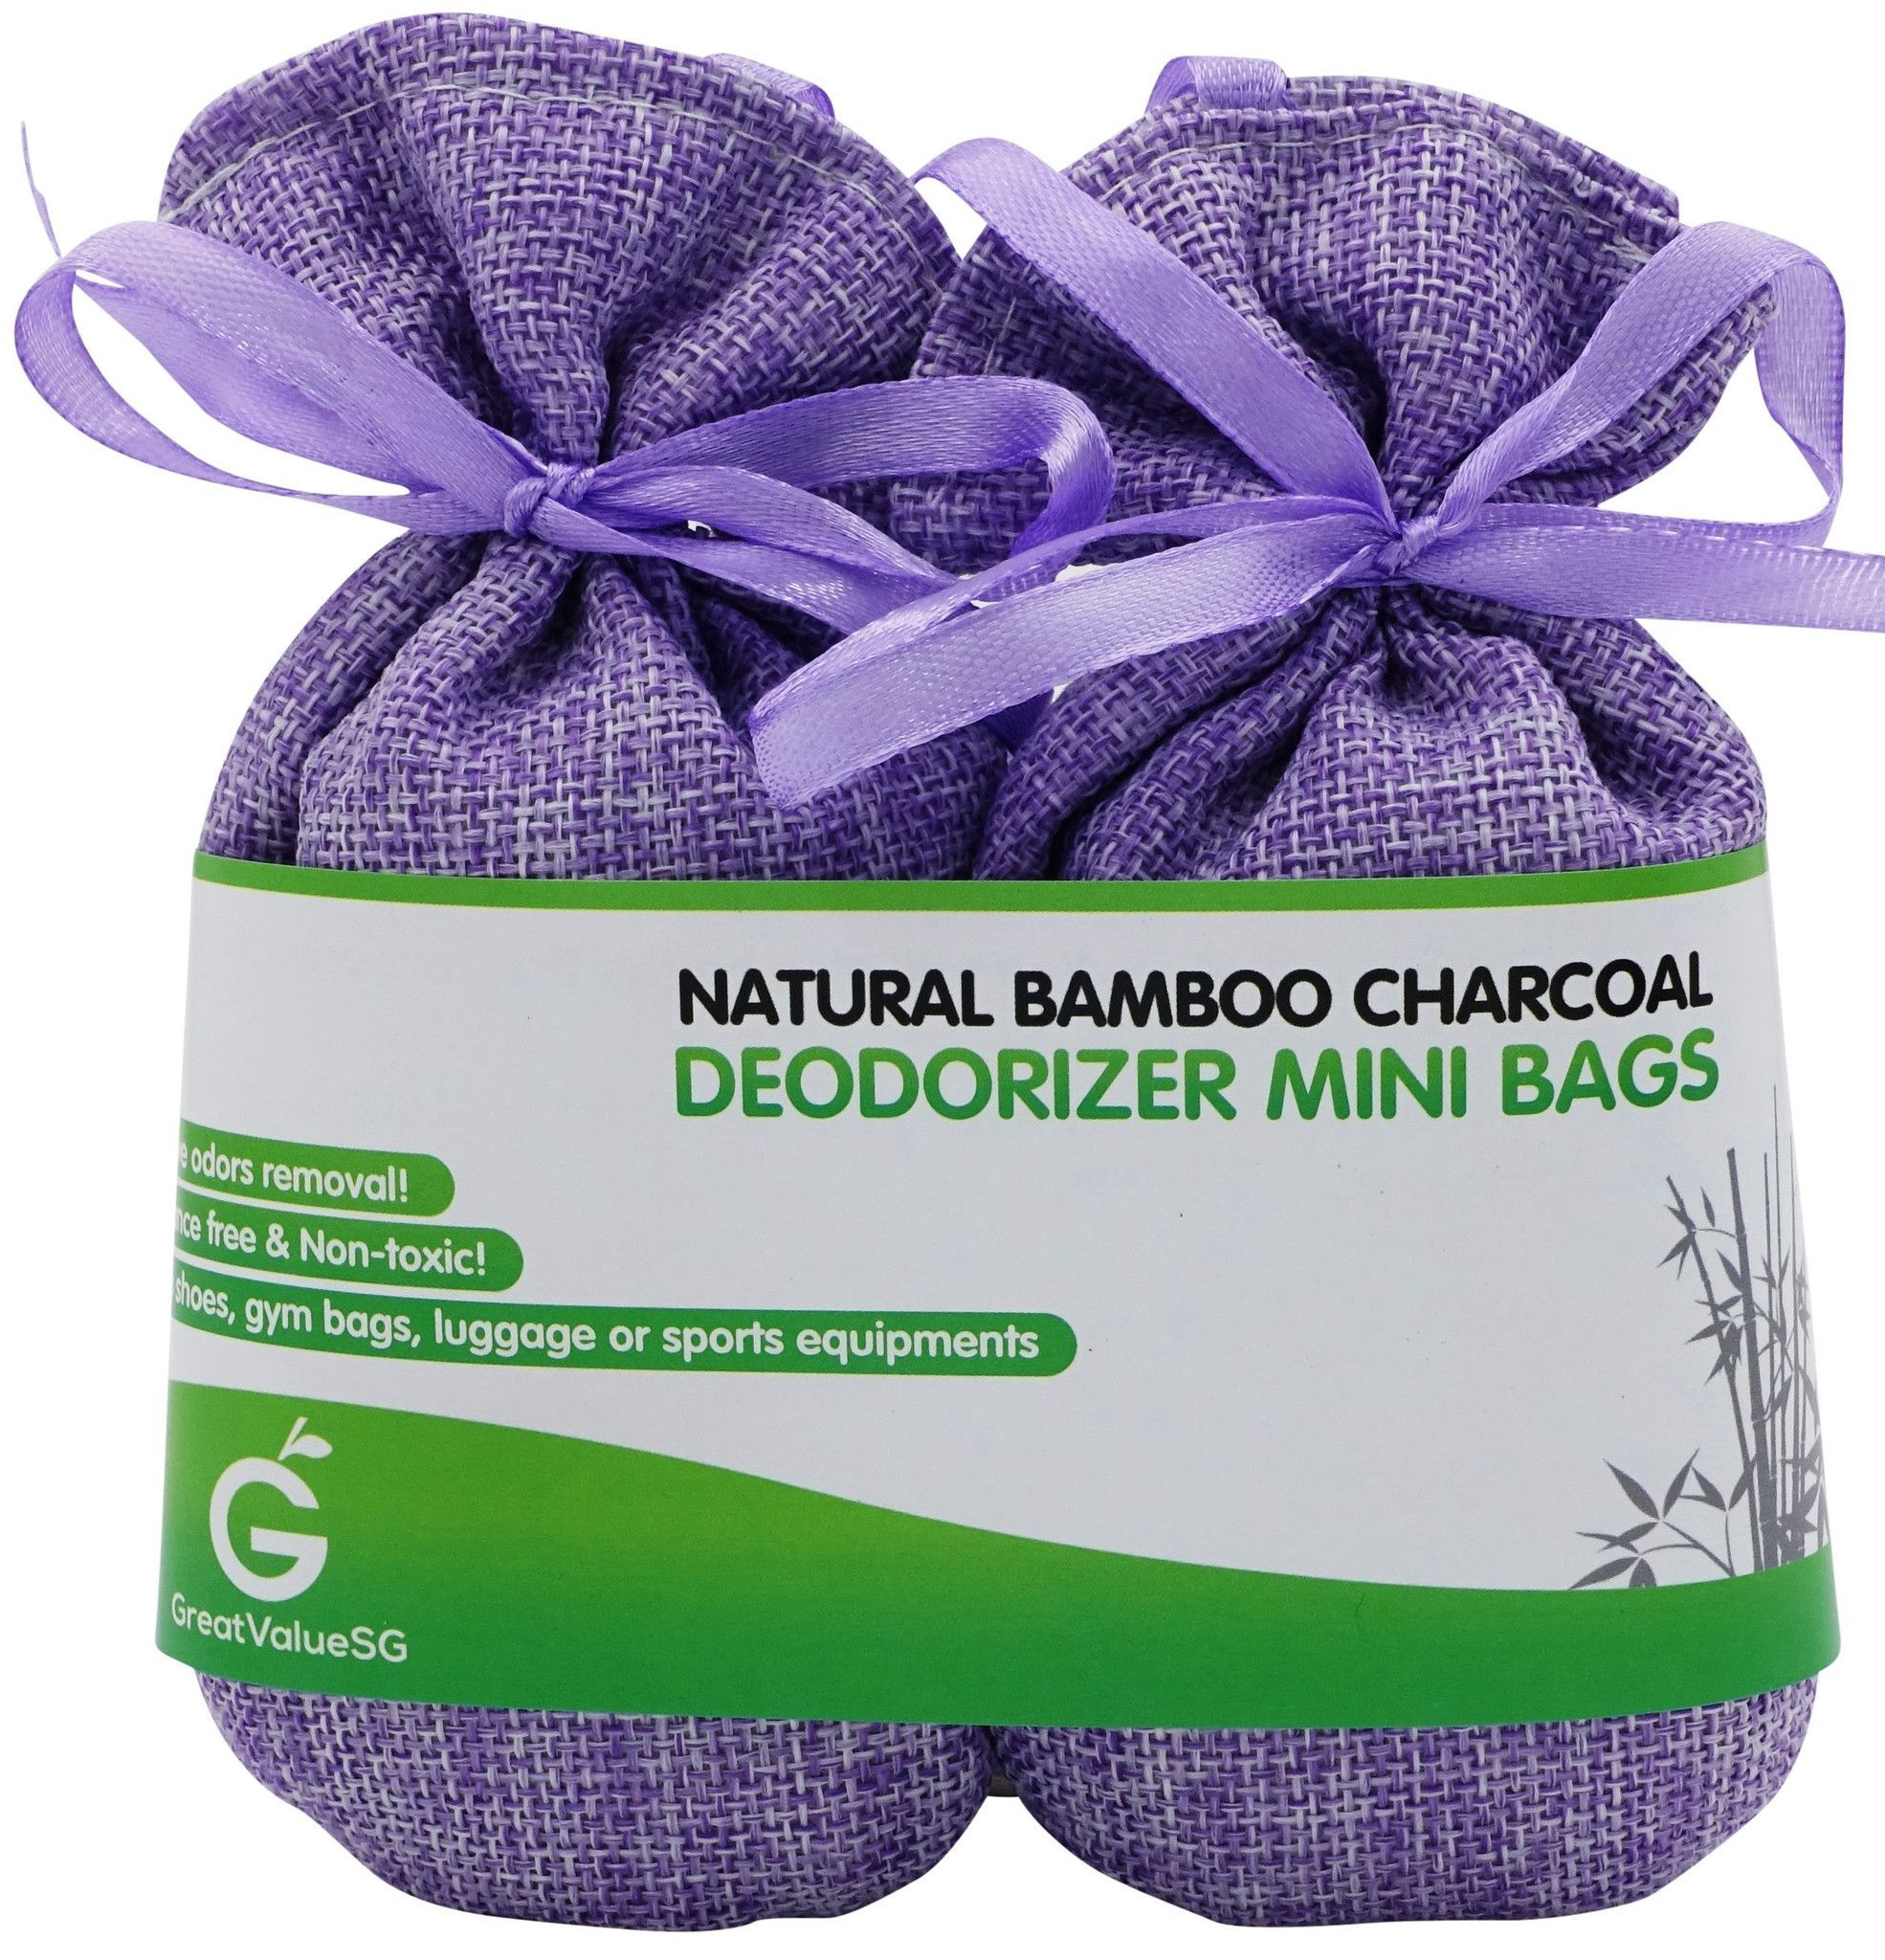 Bamboo Charcoal Deodorizer Mini Bags Mini bag, Deodorant